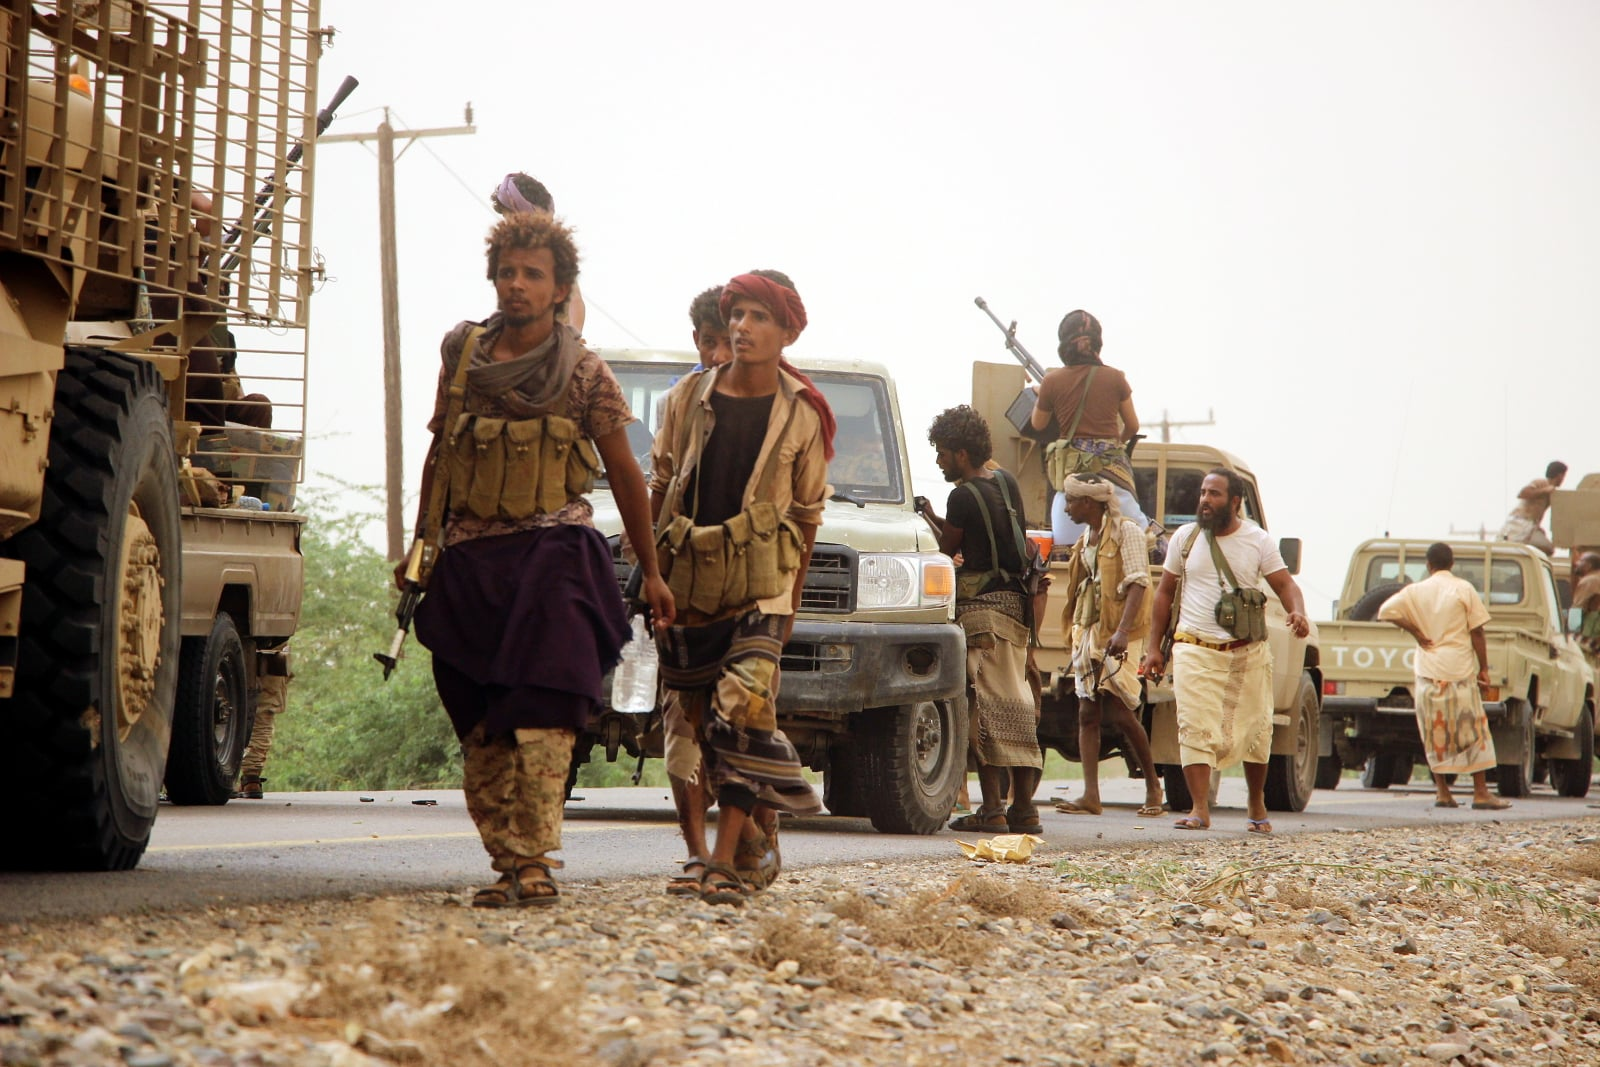 Konflikt w Jemenie fot. EPA/NAJEEB ALMAHBOOBI Dostawca: PAP/EPA.